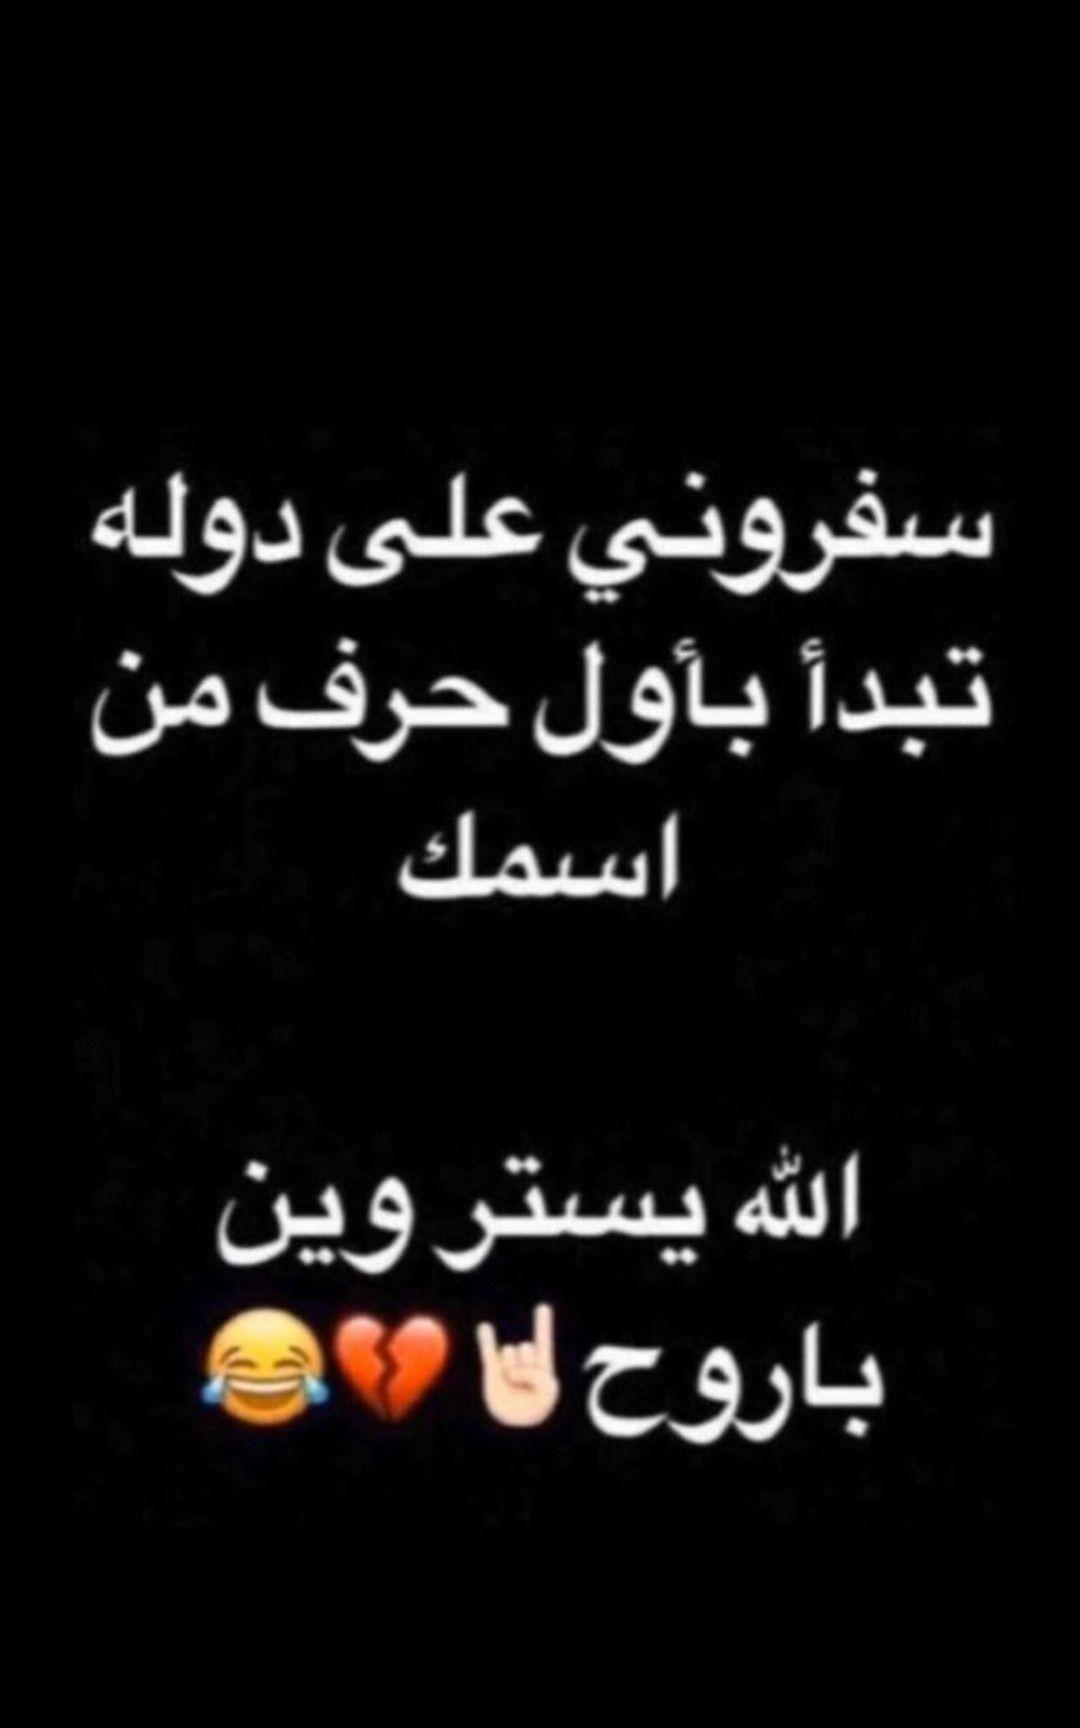 Pin By O Uo Uuuuuu On ءحححح Funny Study Quotes Fun Quotes Funny Funny Arabic Quotes